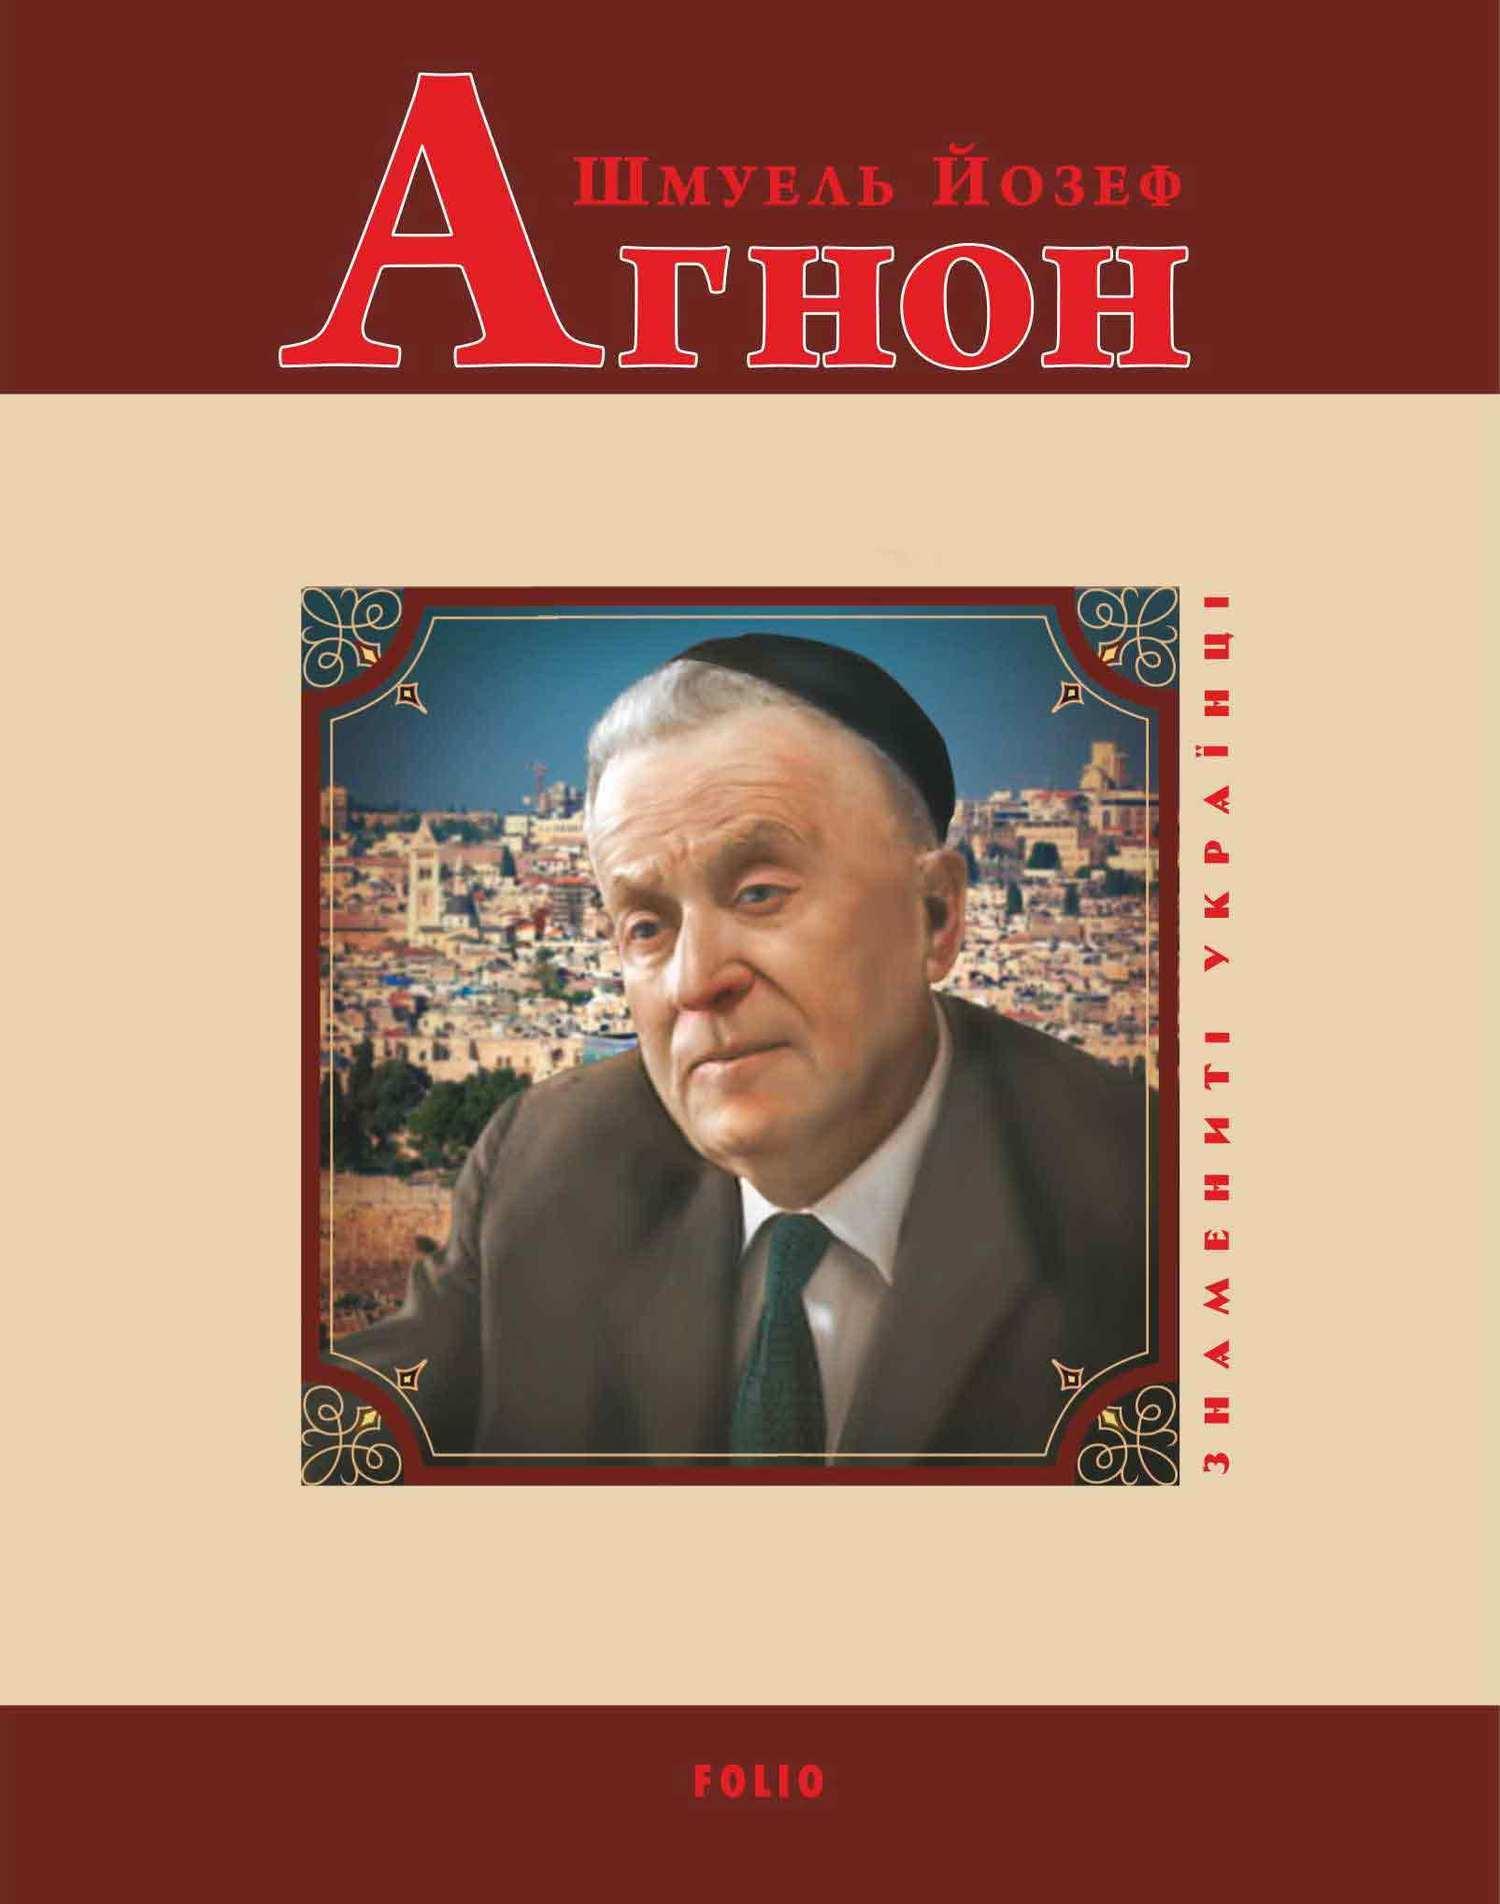 Олександр Левченко Шмуель Йозеф Агнон ISBN: 978-966-03-7891-9 дмитро павличко любов і ненависть вибране